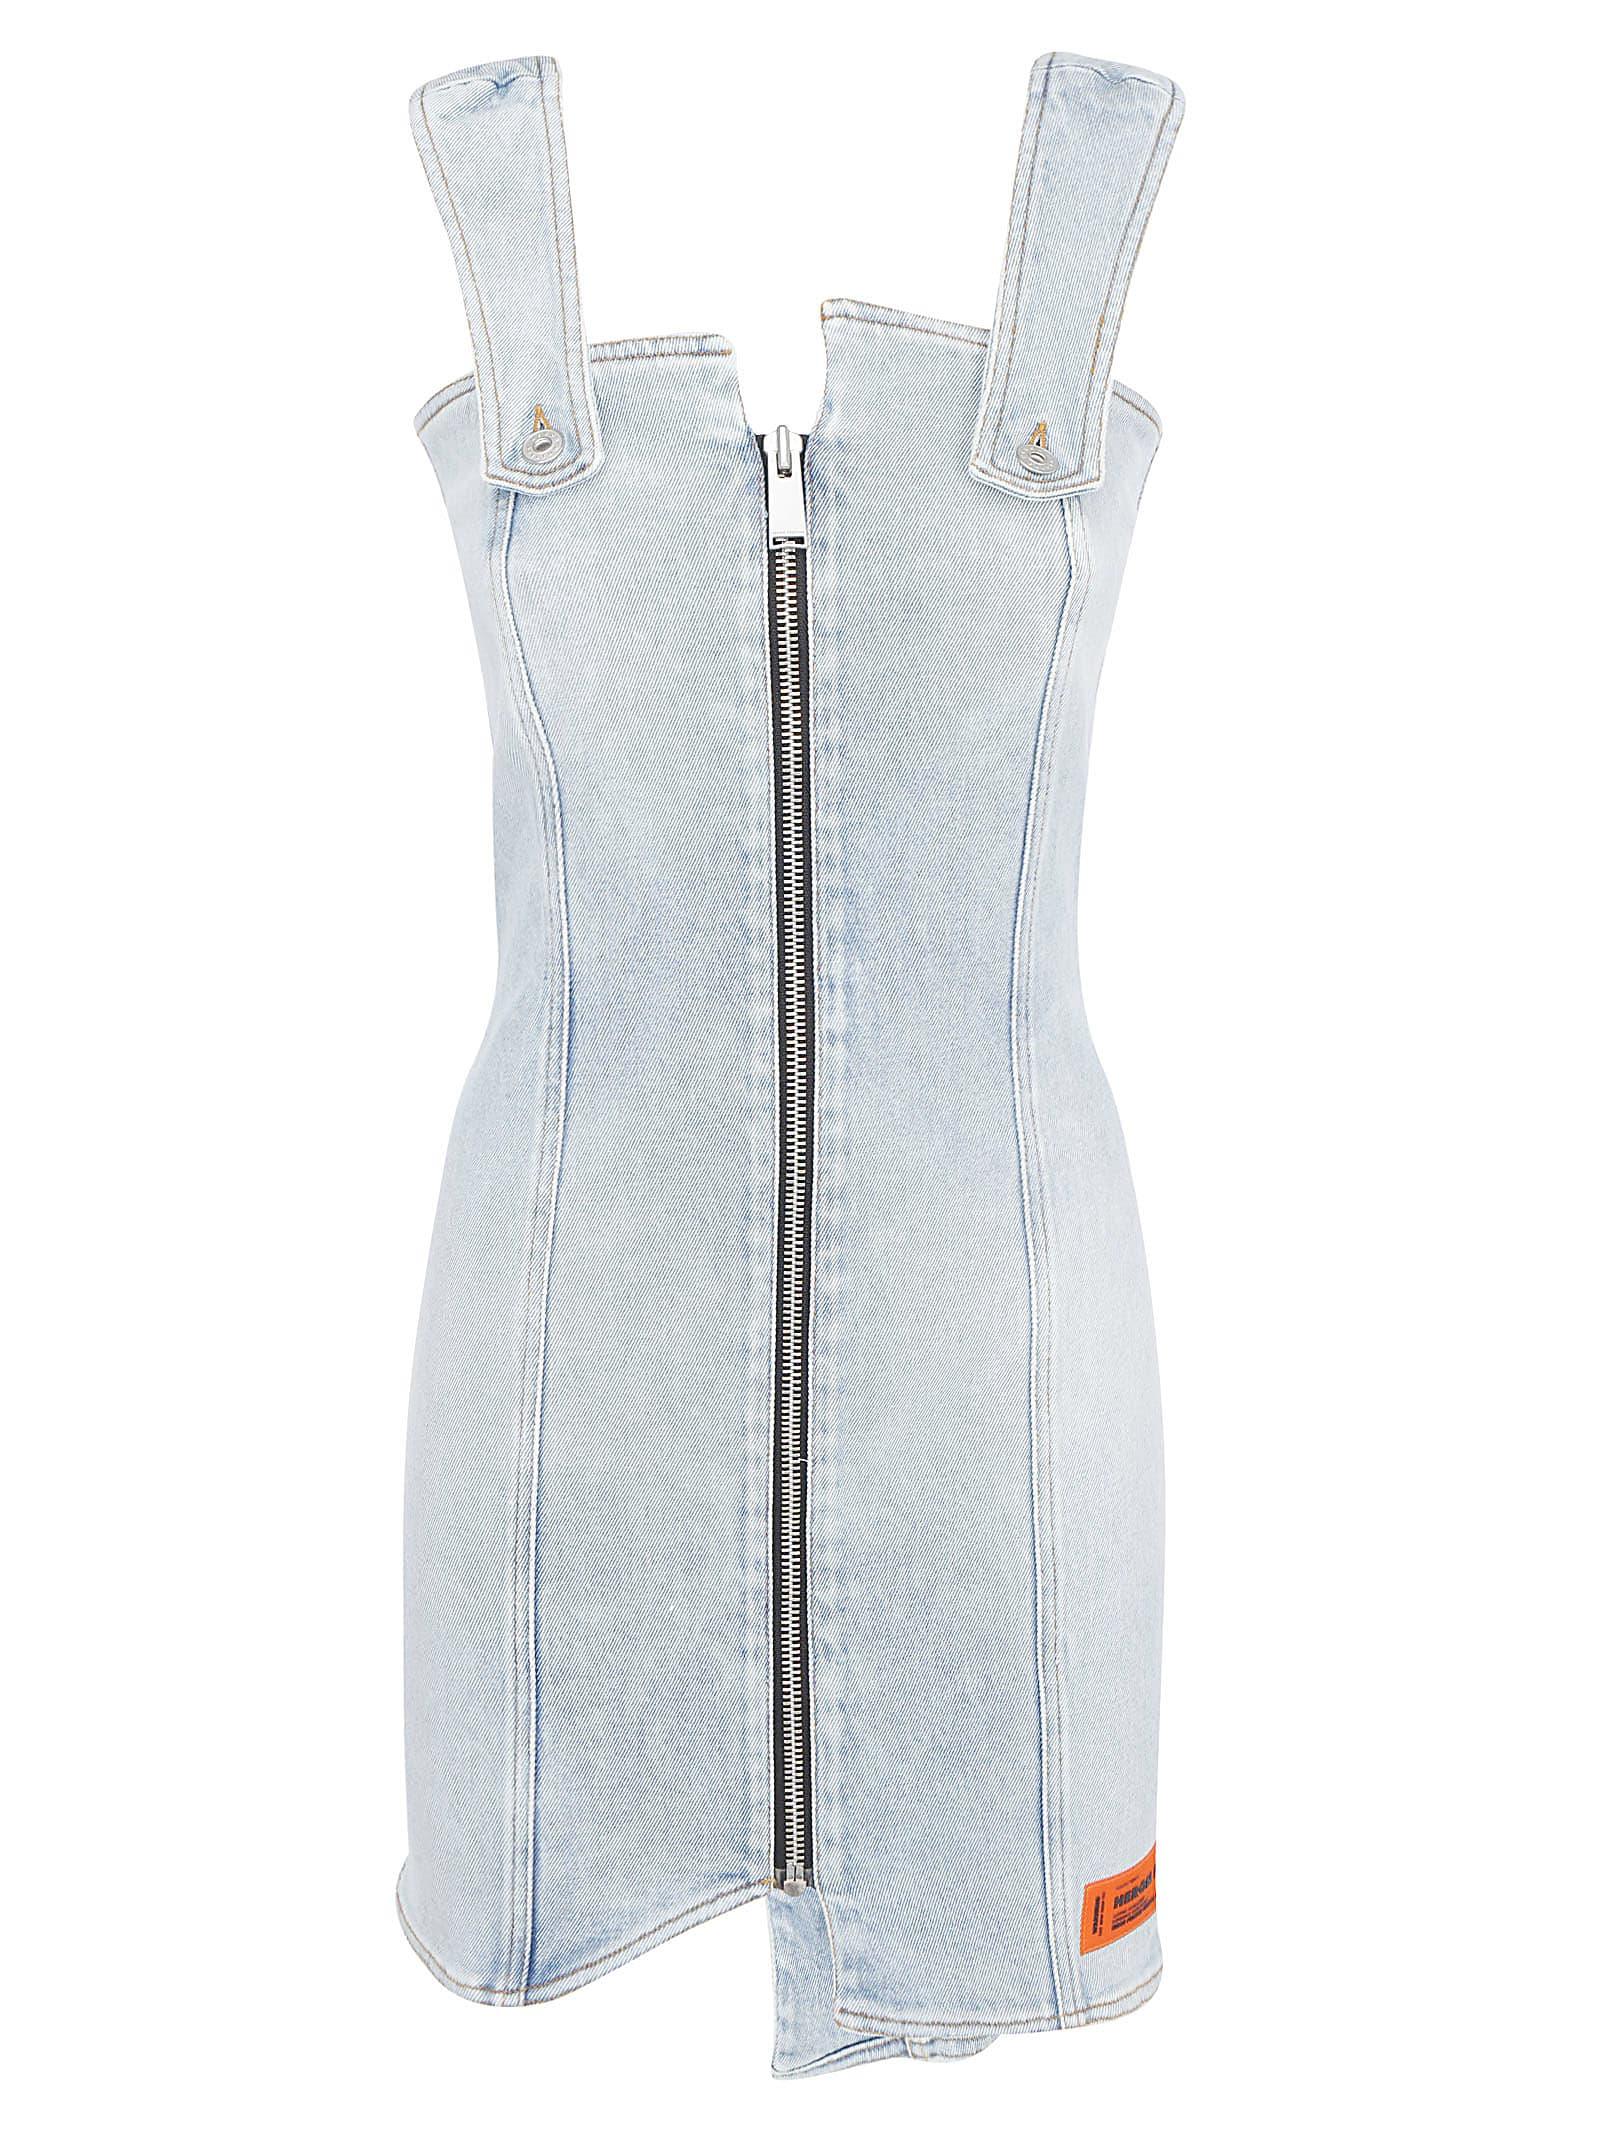 Buy Heron Preston Denim Dress online, shop HERON PRESTON with free shipping